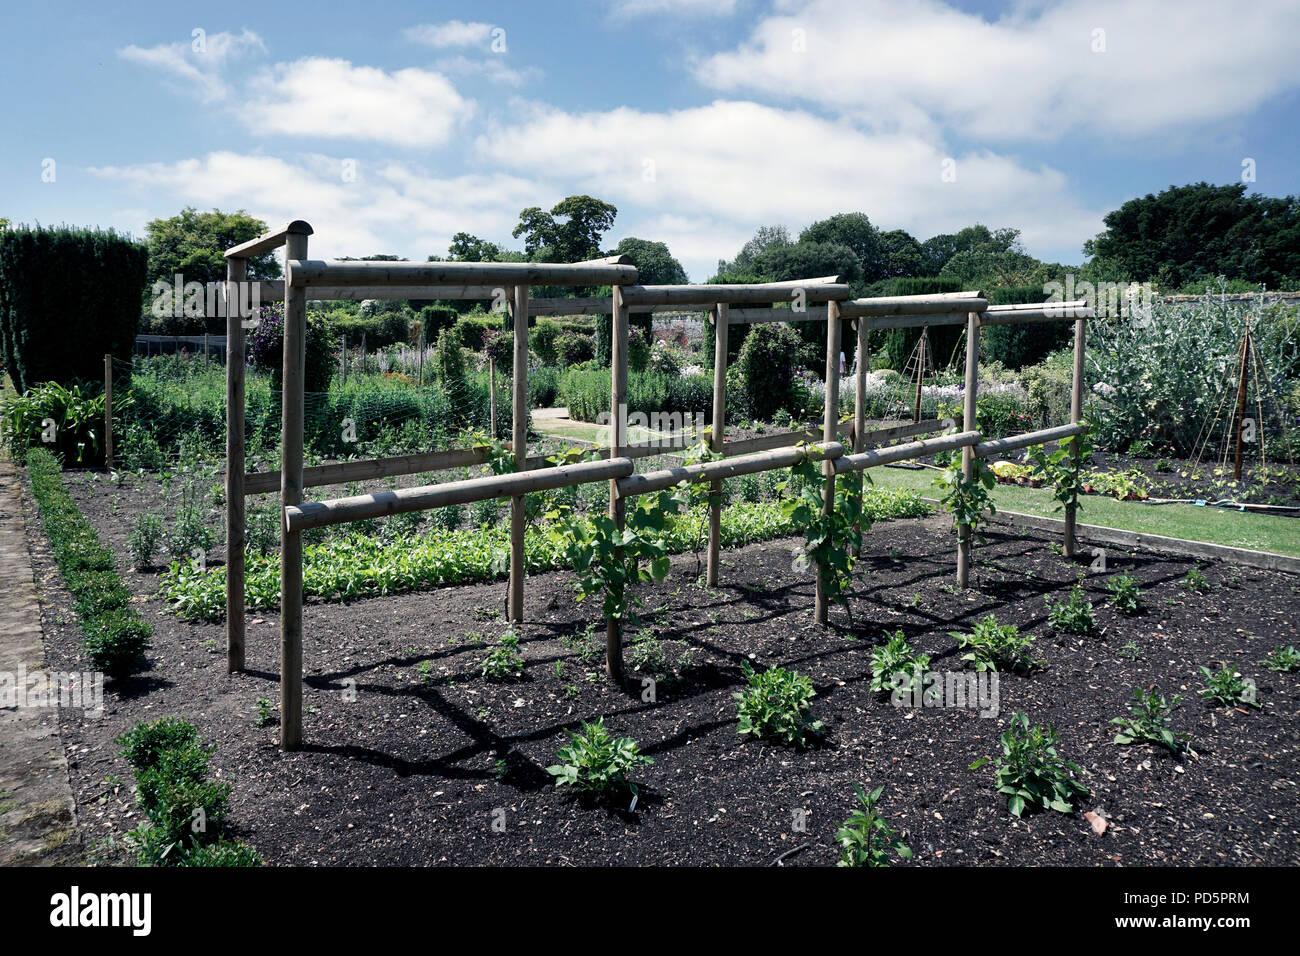 Grape Vine Garden Wooden Support Frame Stock Photo 214642616 Alamy